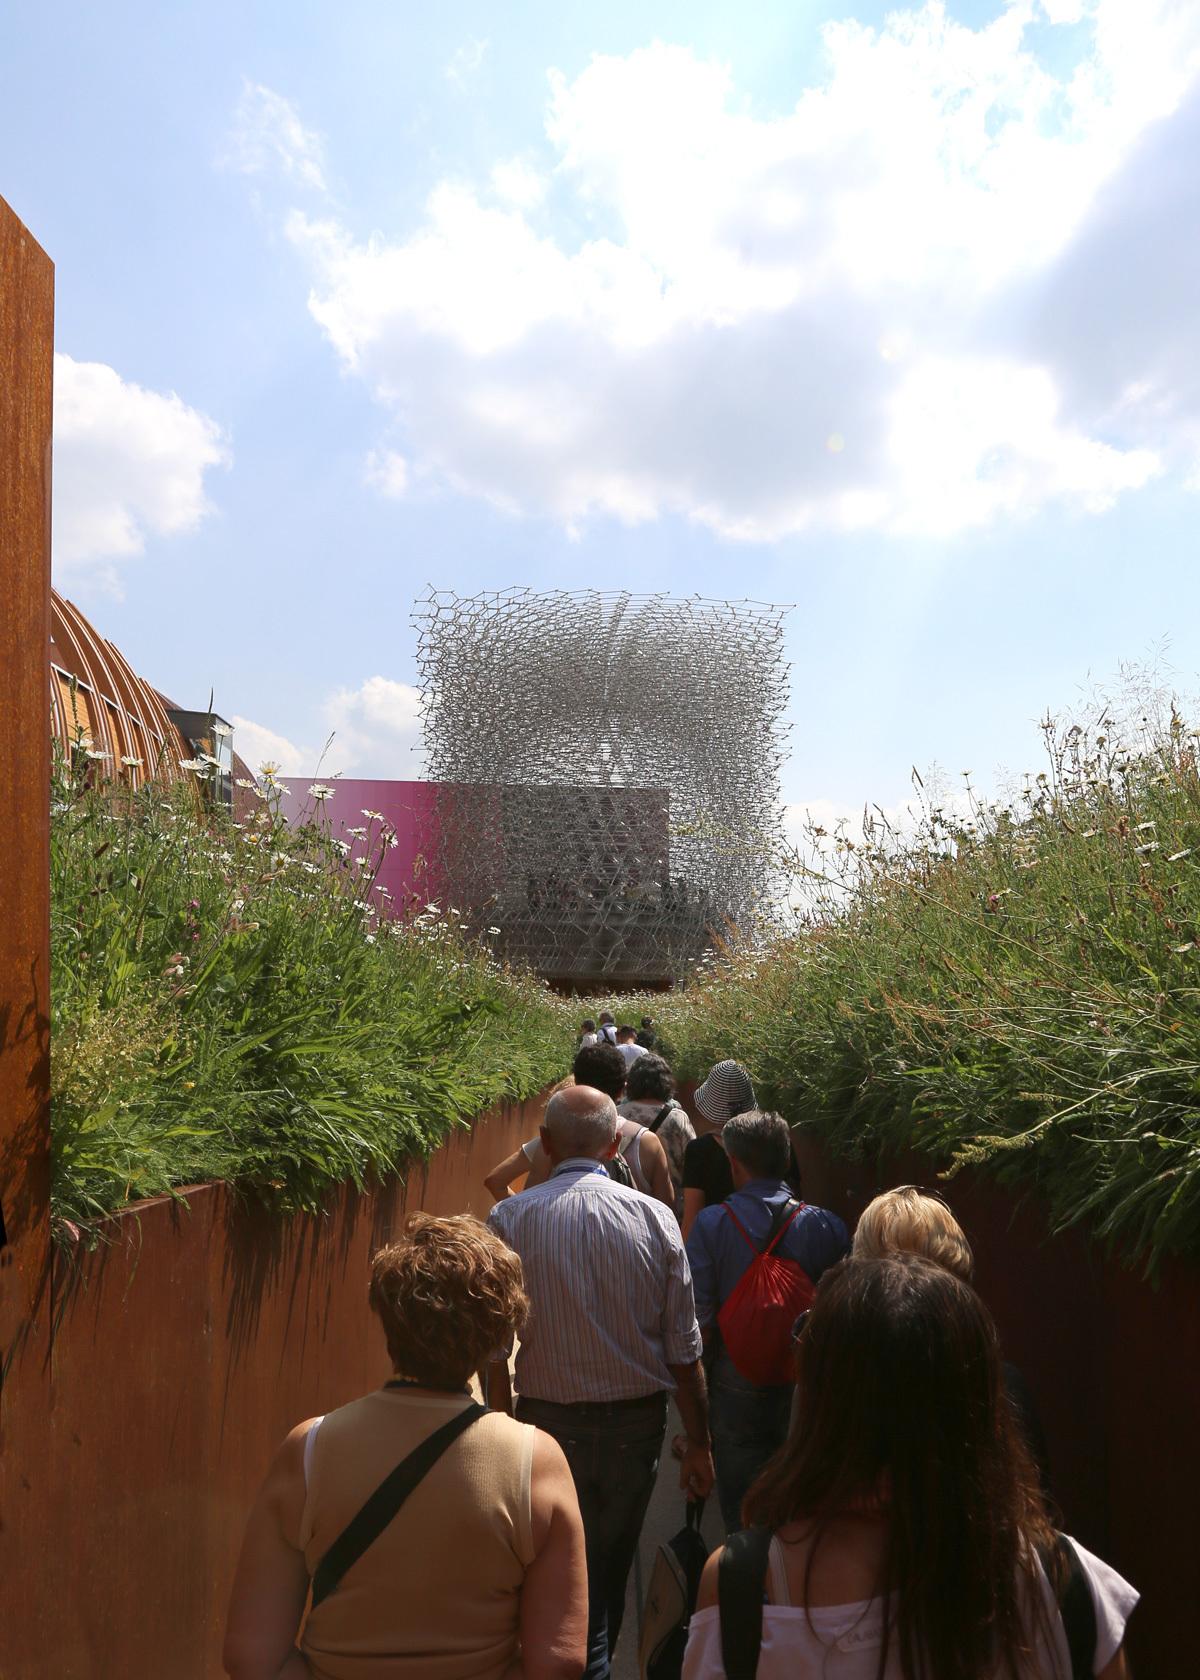 Expo 2015, UK Pavilion, Milan, Italy - L'oeil au raz de l'herbe Expo 2015, UK Pavillon, Milan, Italy - Architects BDP - Artist Wolfgang Buttress - Photo Jean-Yves Soetinck